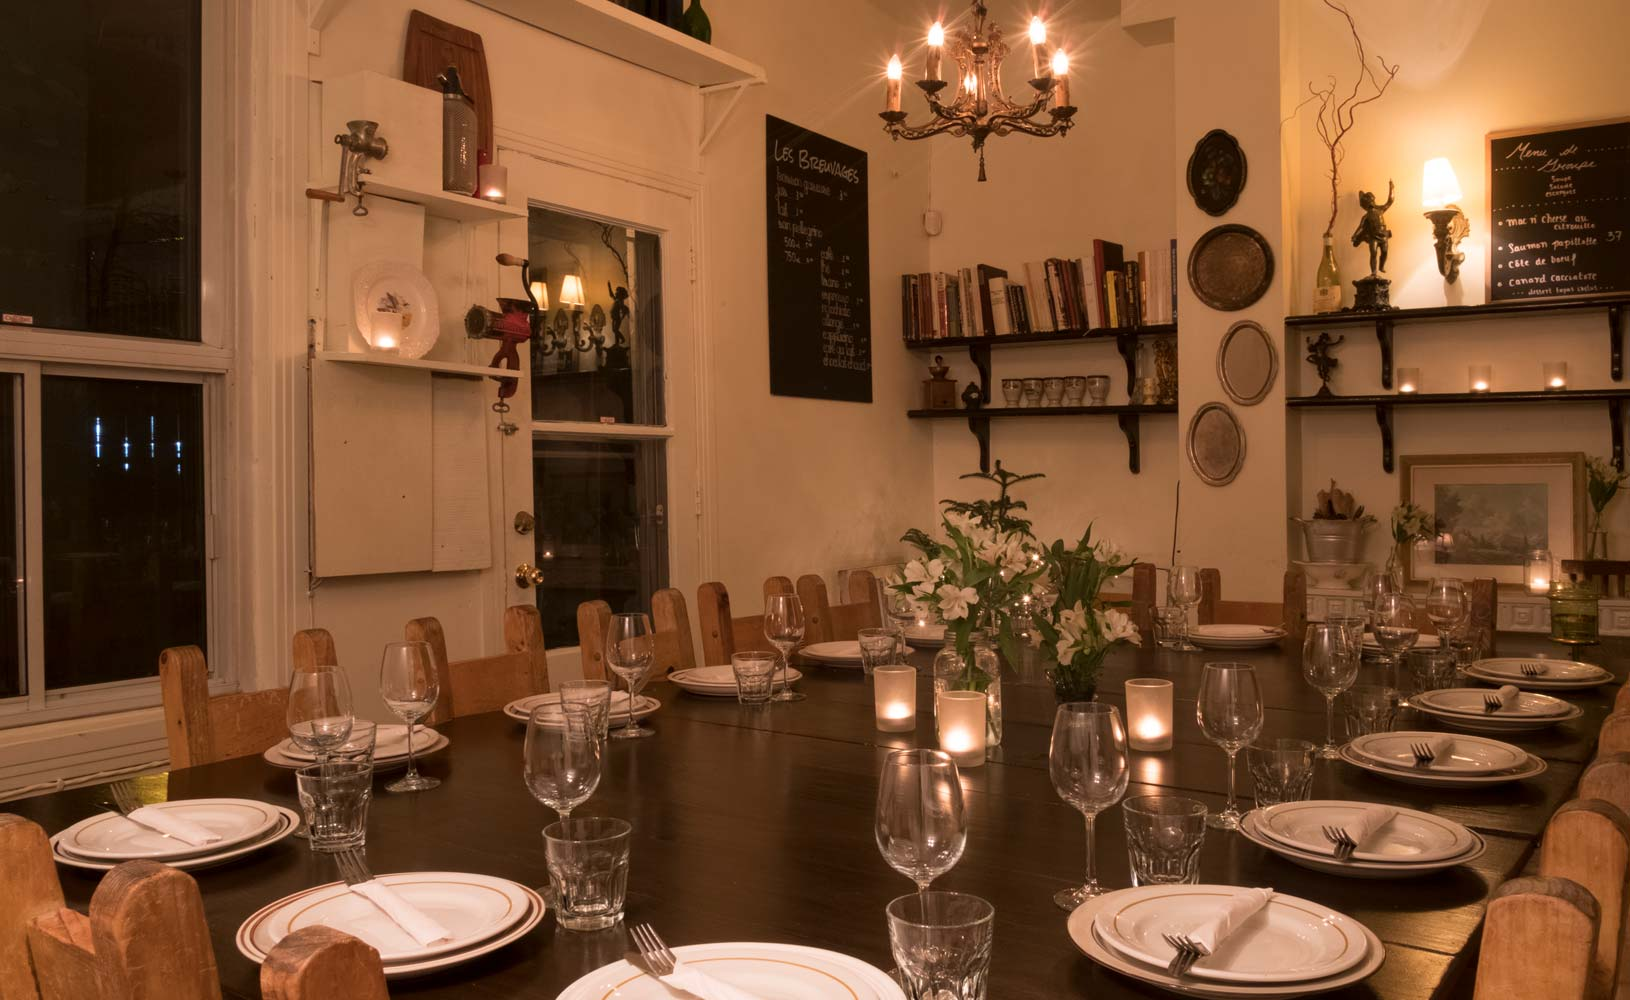 restaurant-machiavelli-cuisine-de-marche-pointe-st-charles-montreal-salle-privee.jpg